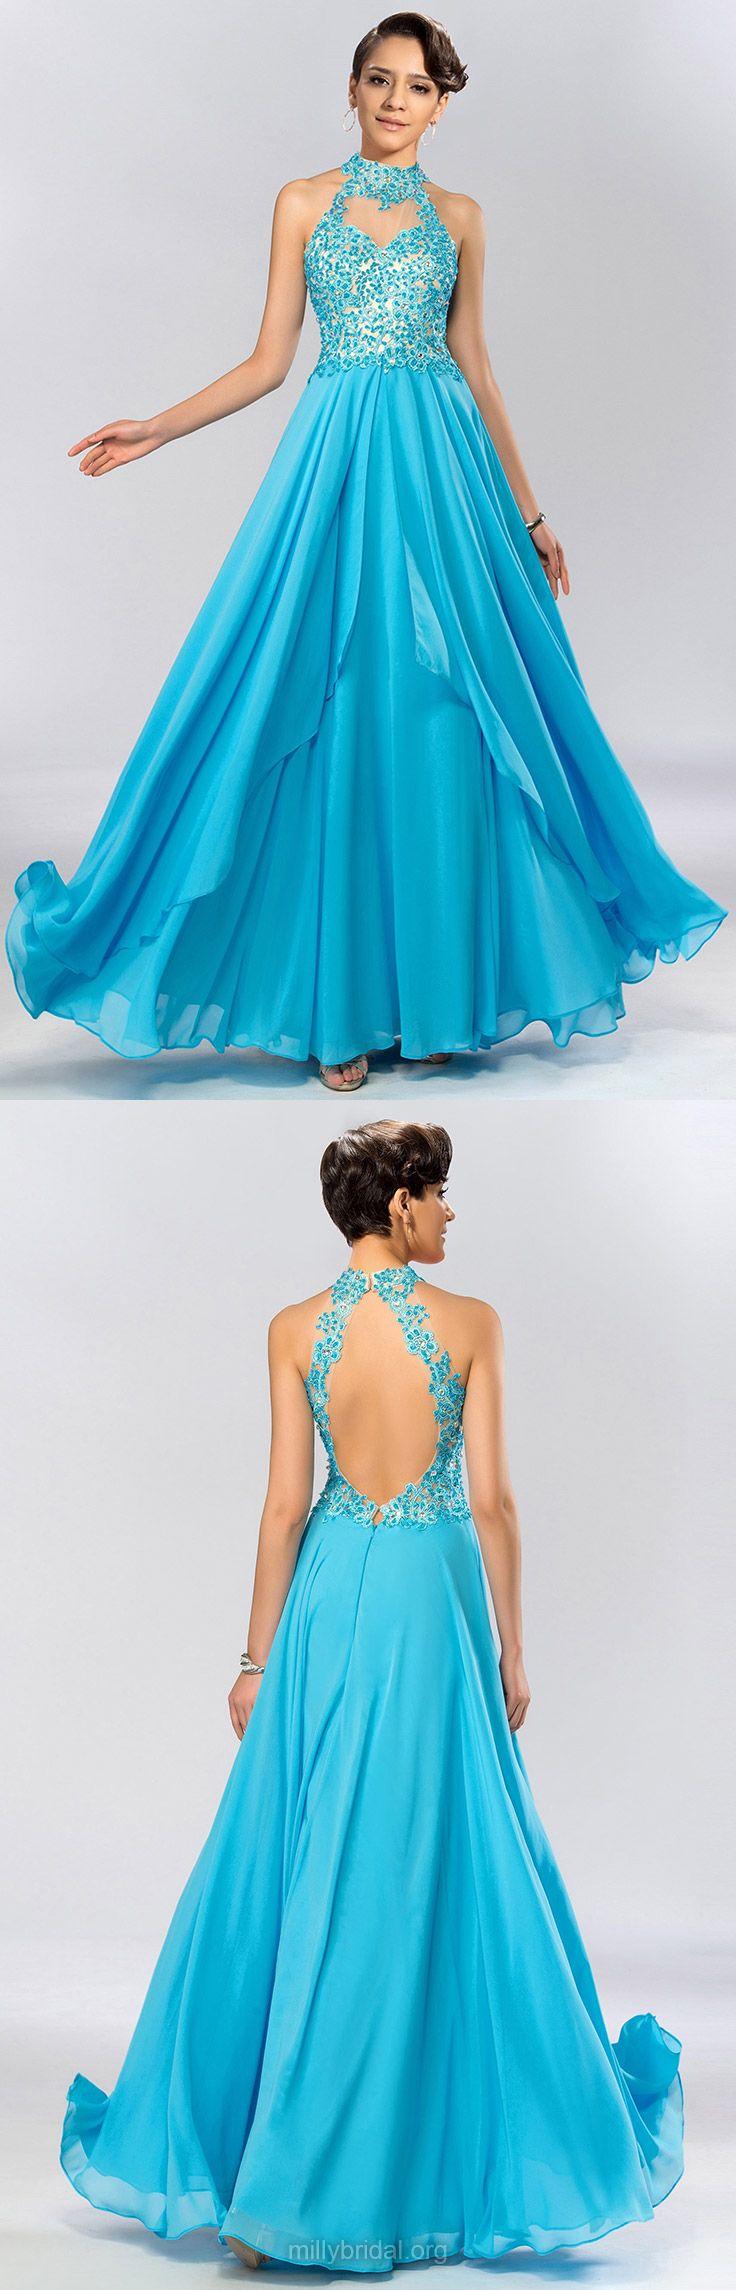 Blue prom dresses long prom dresses lace prom dresses prom